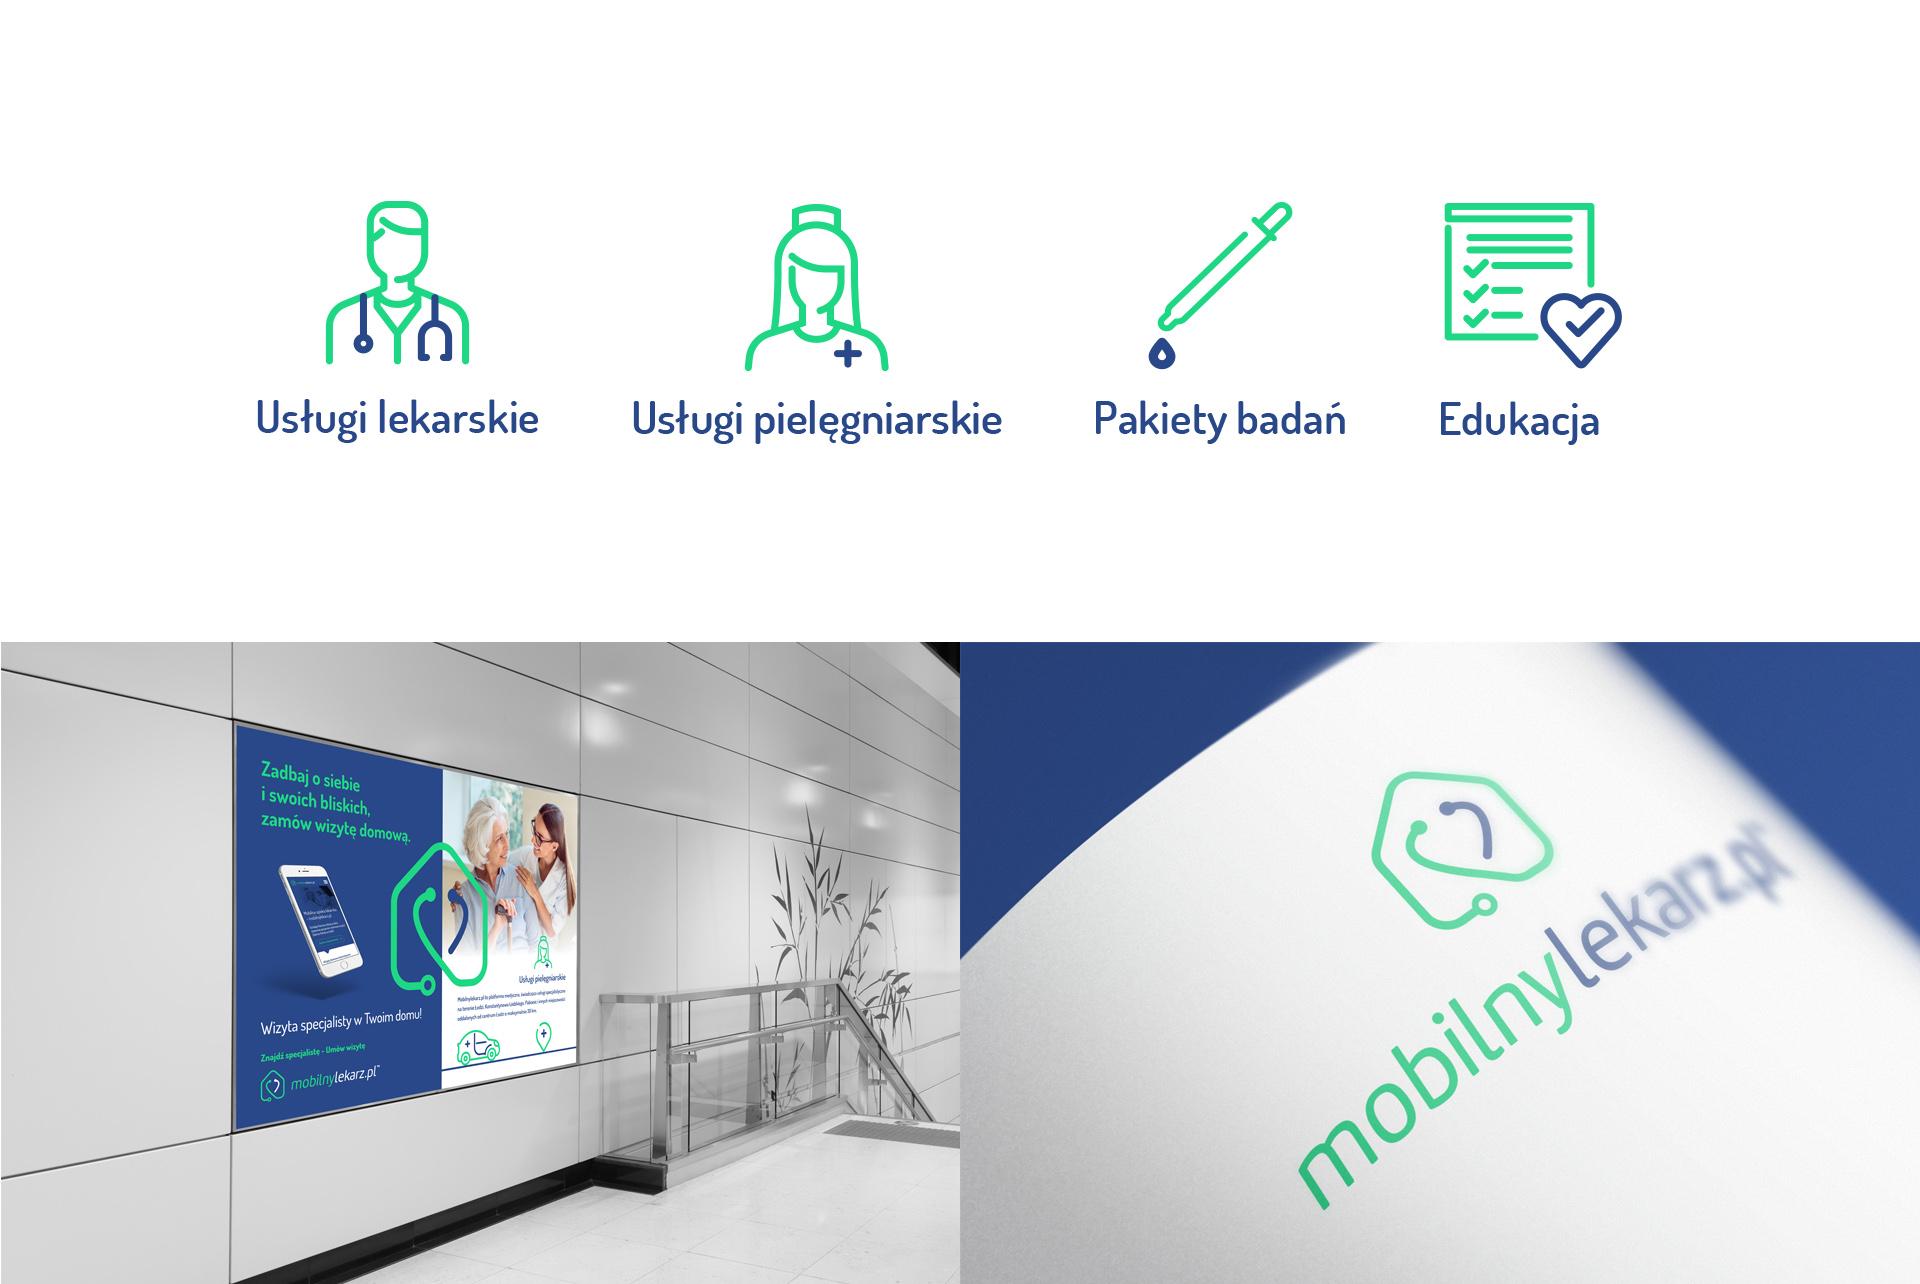 Medical Corporate Identity Piktogram Ikony Icons